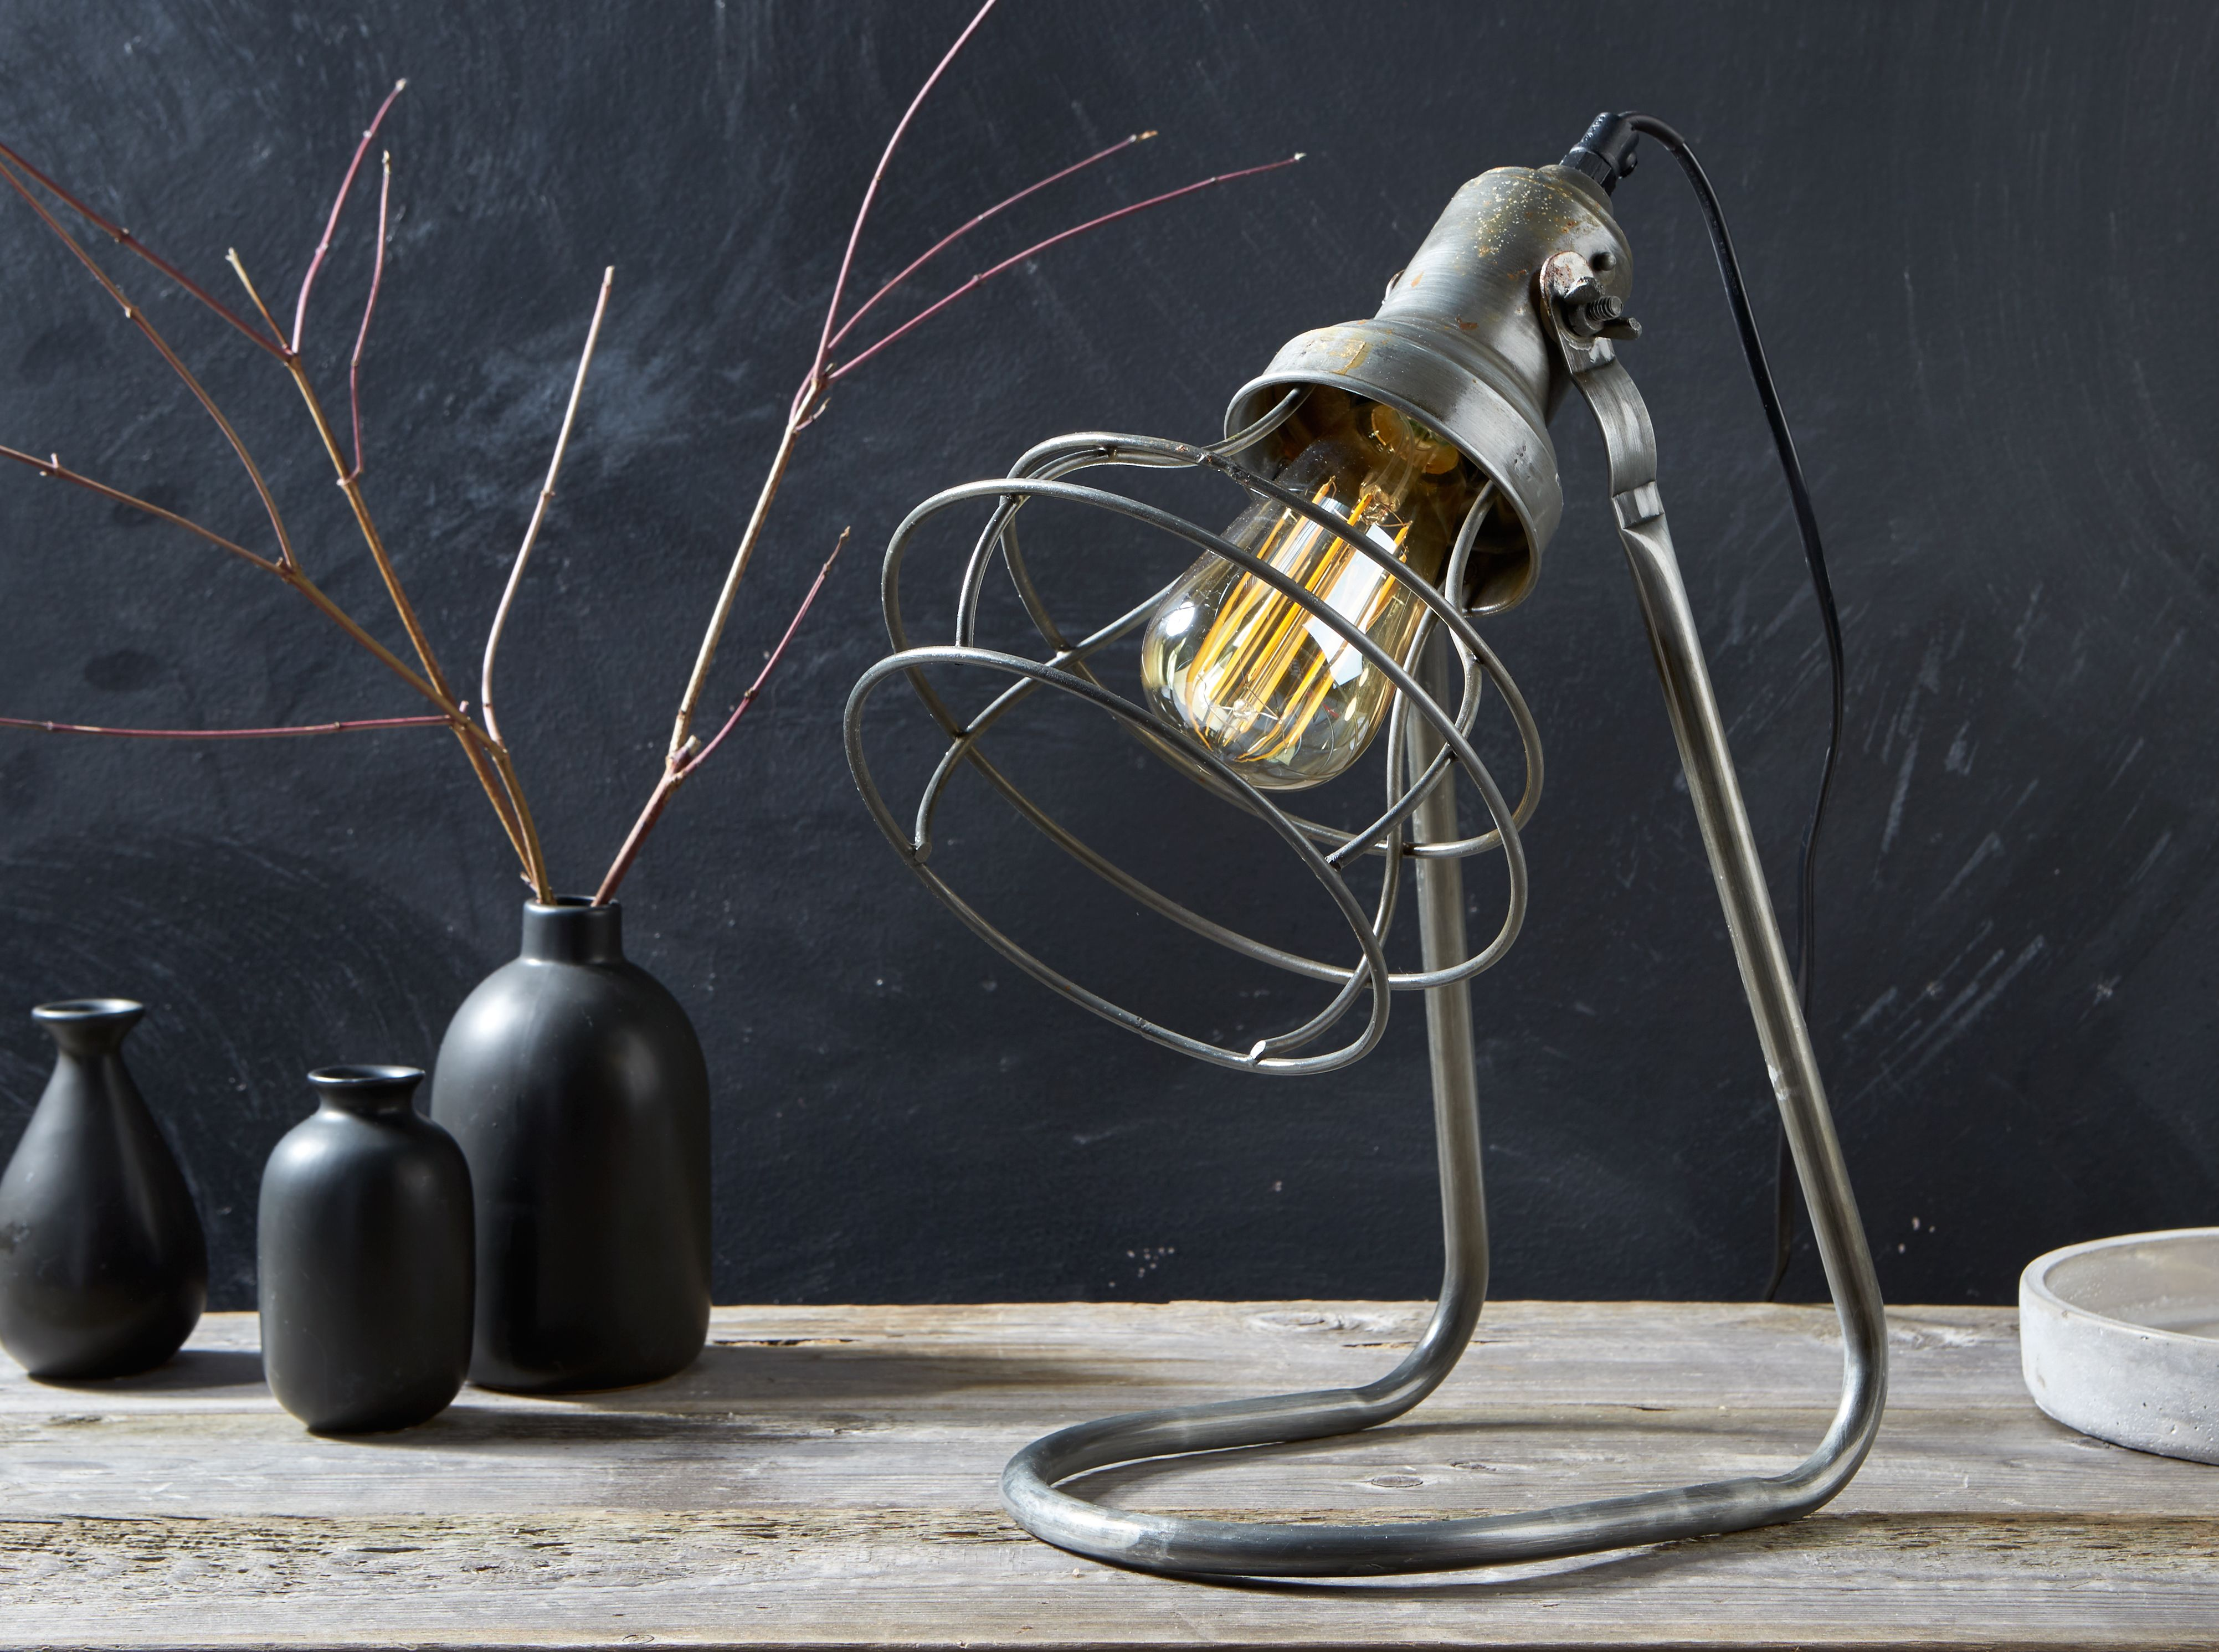 Kwantum Lampen Plafond : Tafellamp hector kwantum decoratie huis pinterest